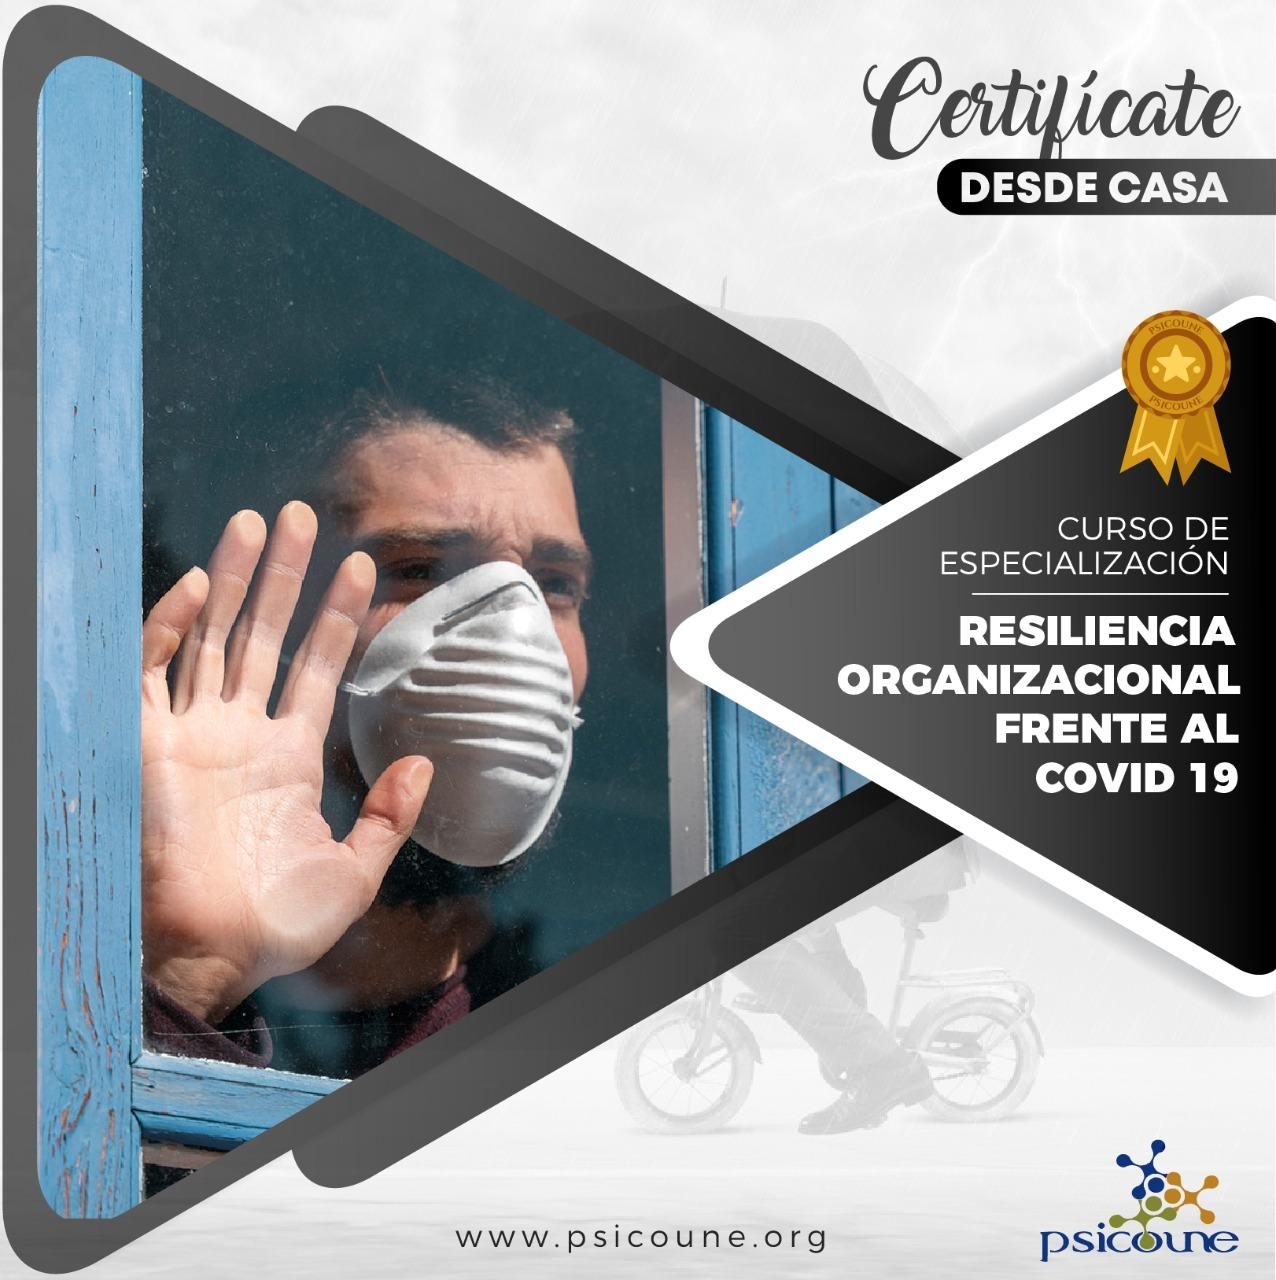 CURSO DE ESPECIALIZACIÓN: RESILIENCIA ORGANIZACIONAL FRENTE AL COVID 19